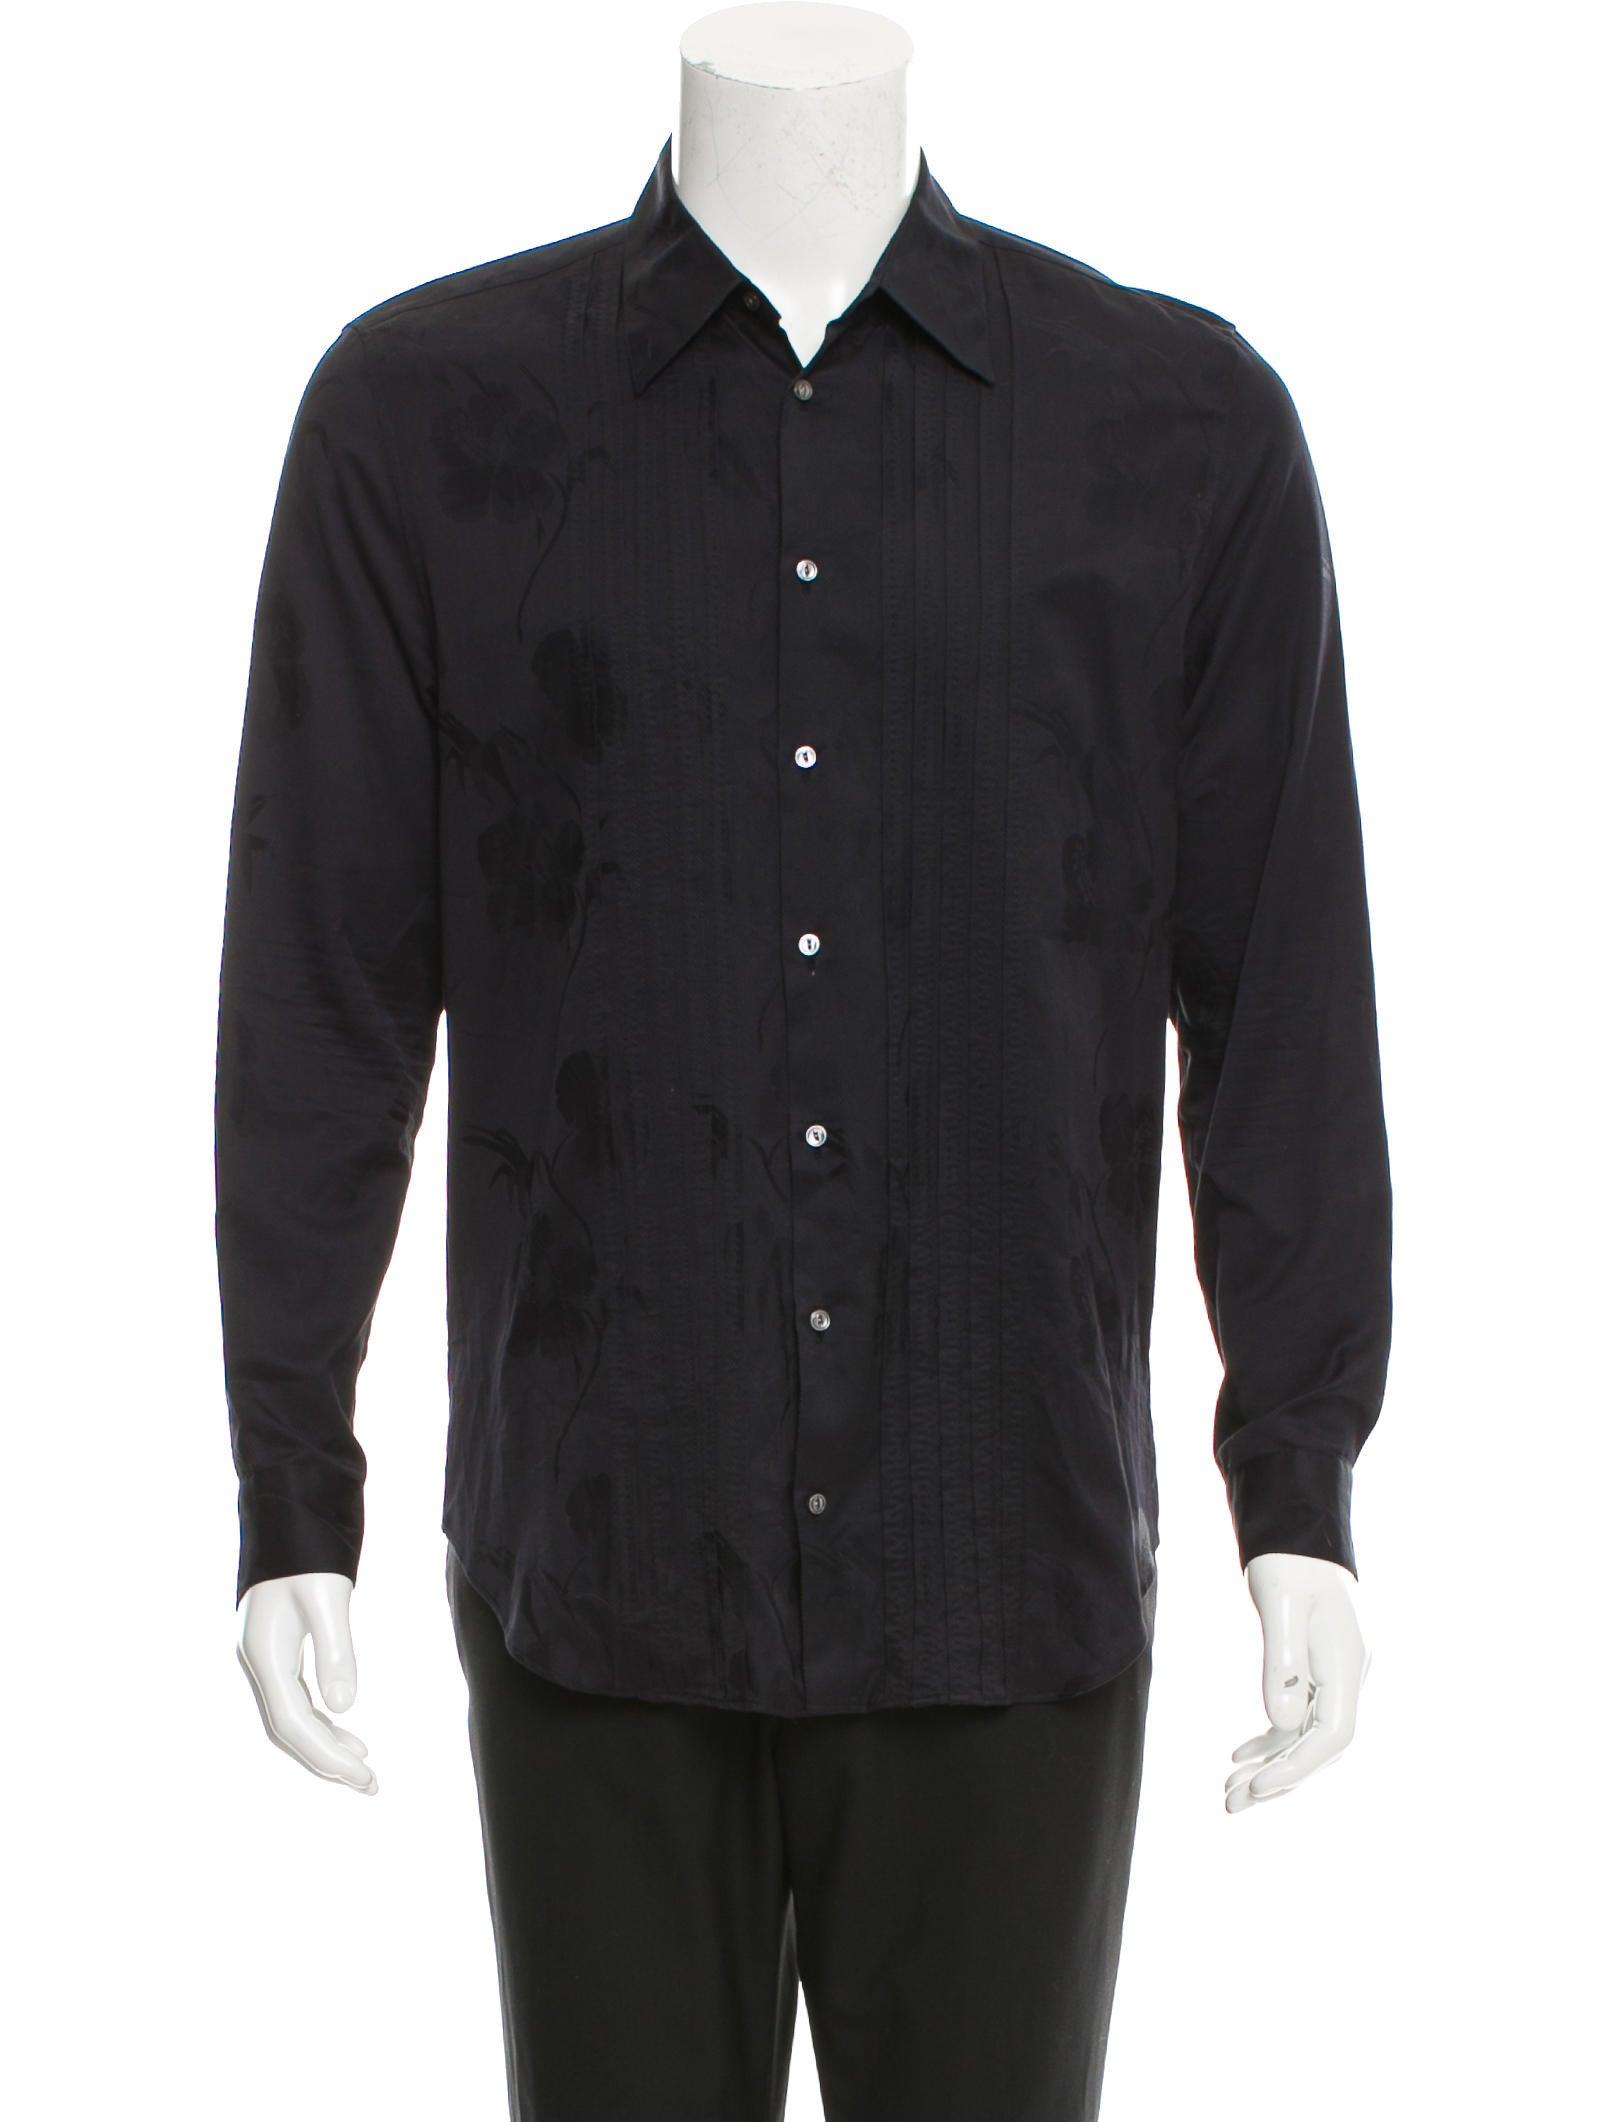 Louis vuitton floral print button up shirt clothing for Floral print button up shirt